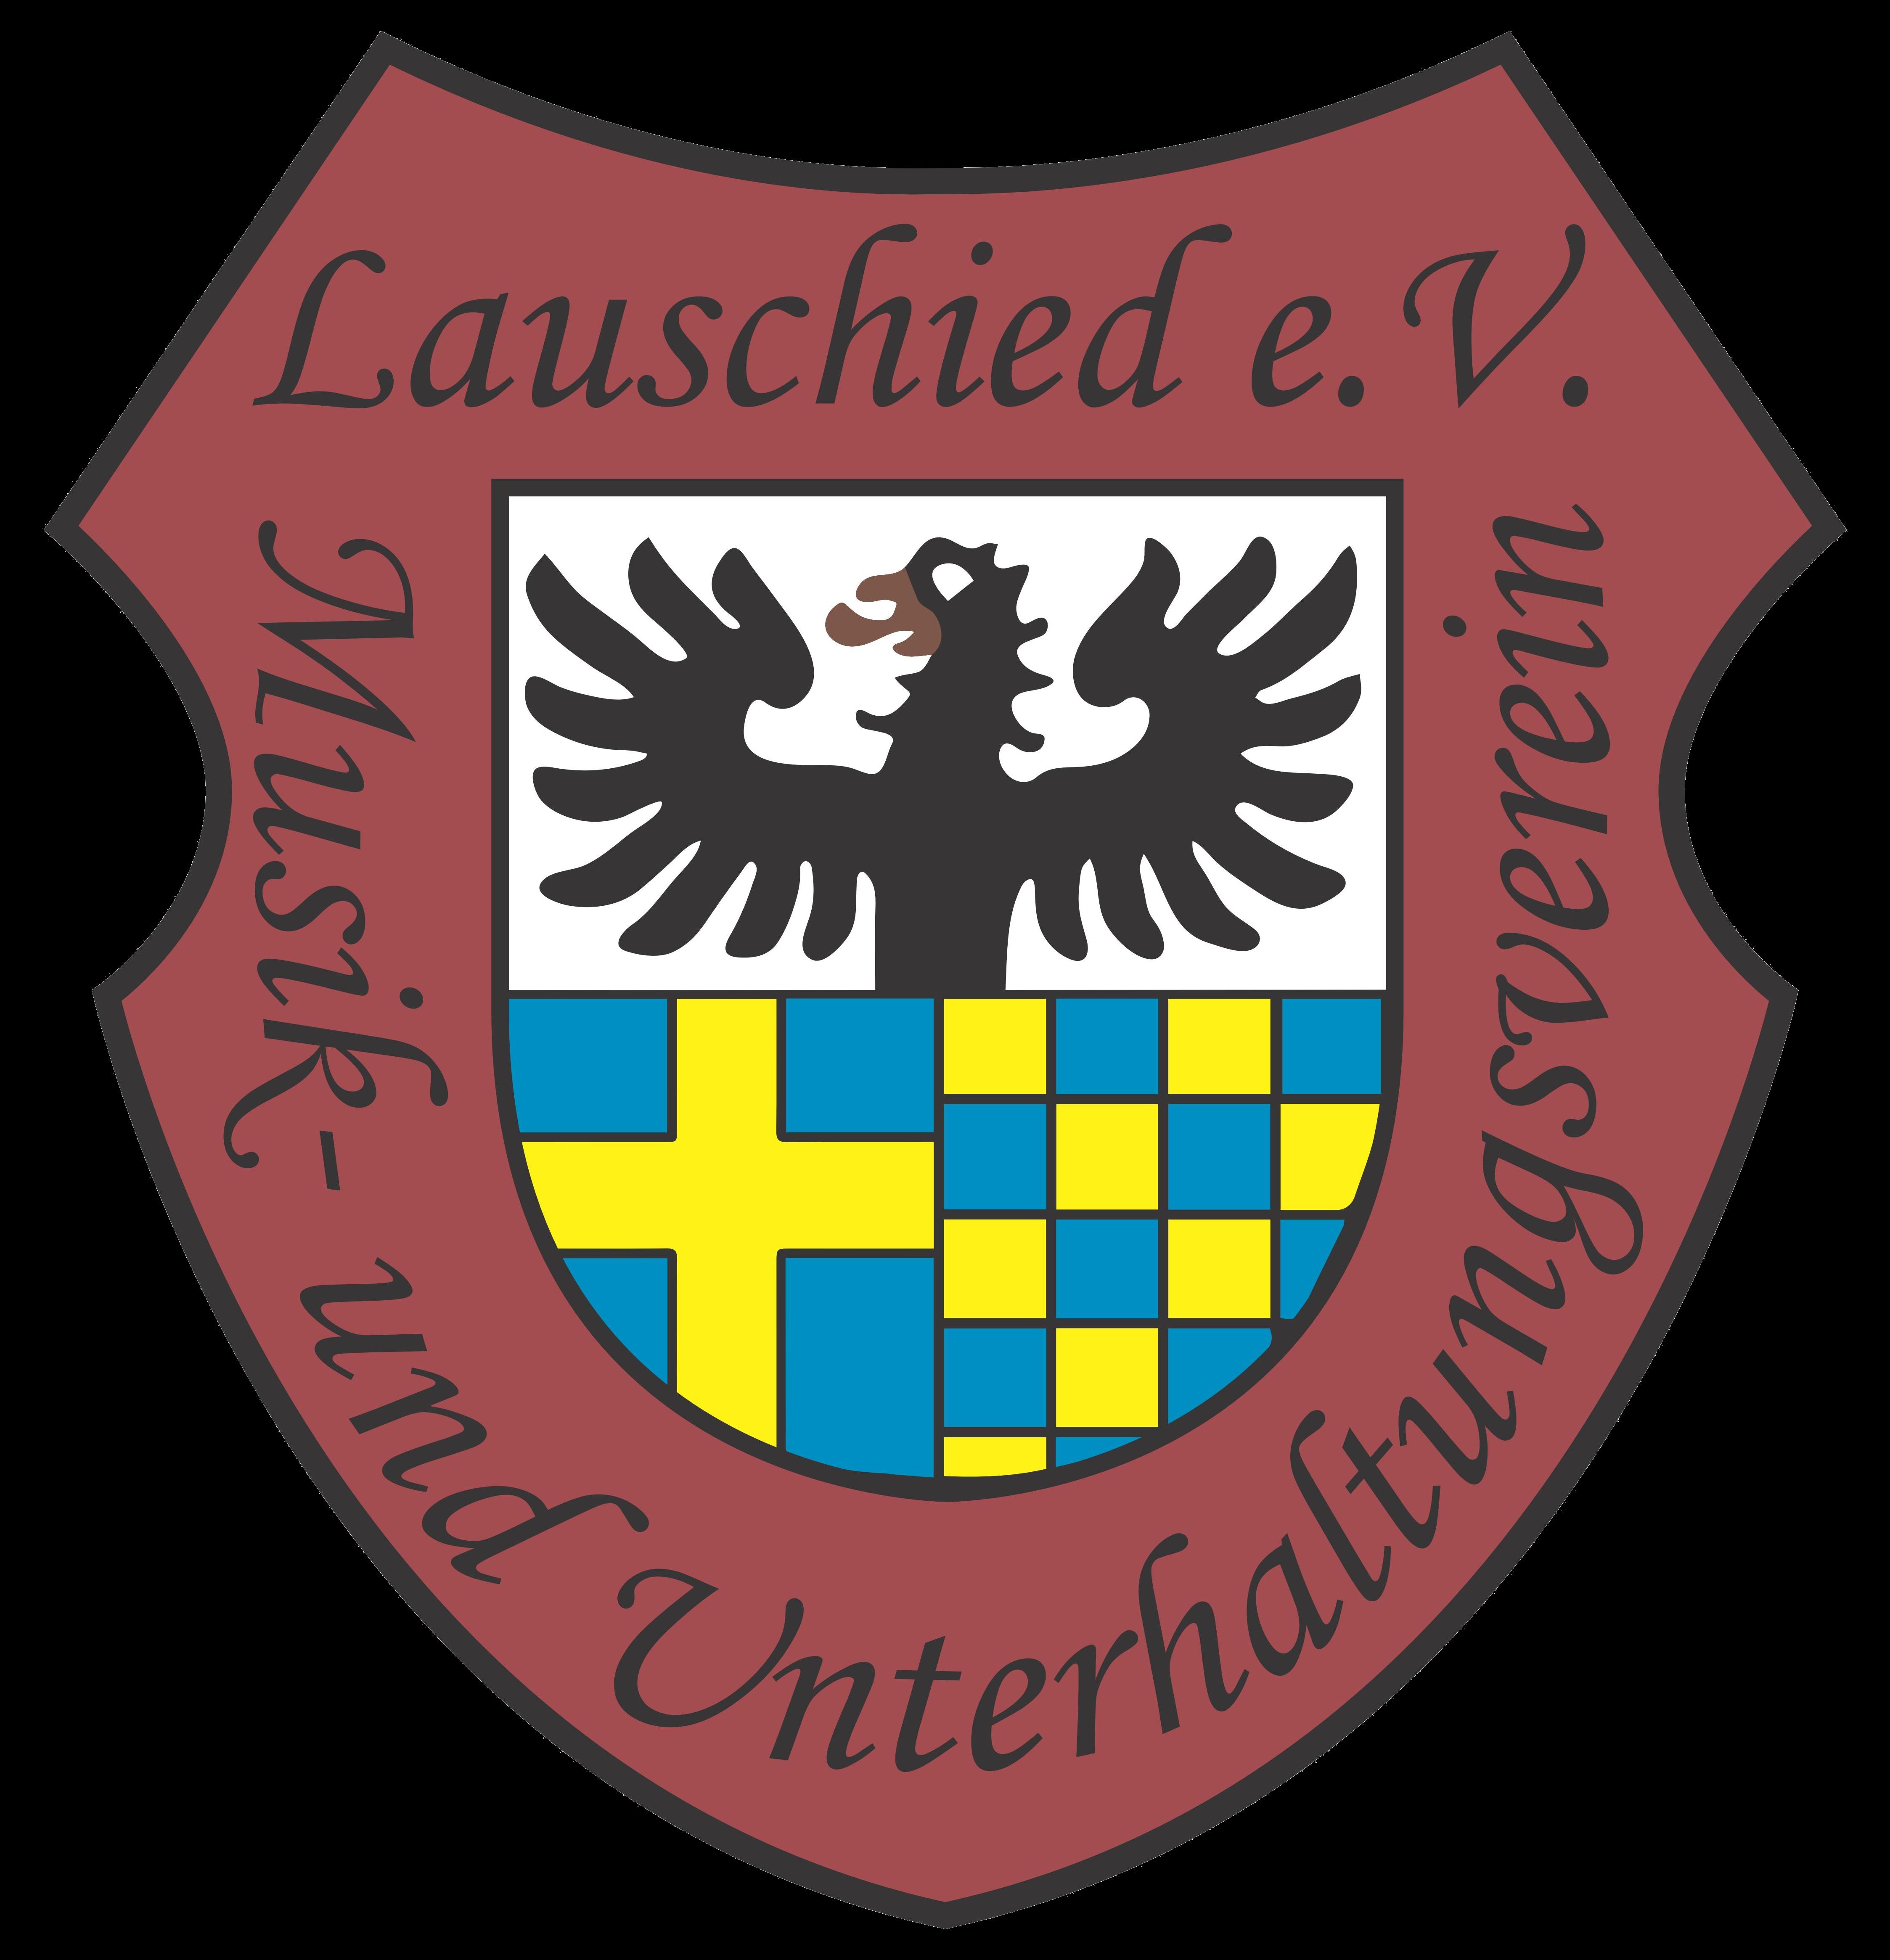 (c) Musikverein-lauschied.de